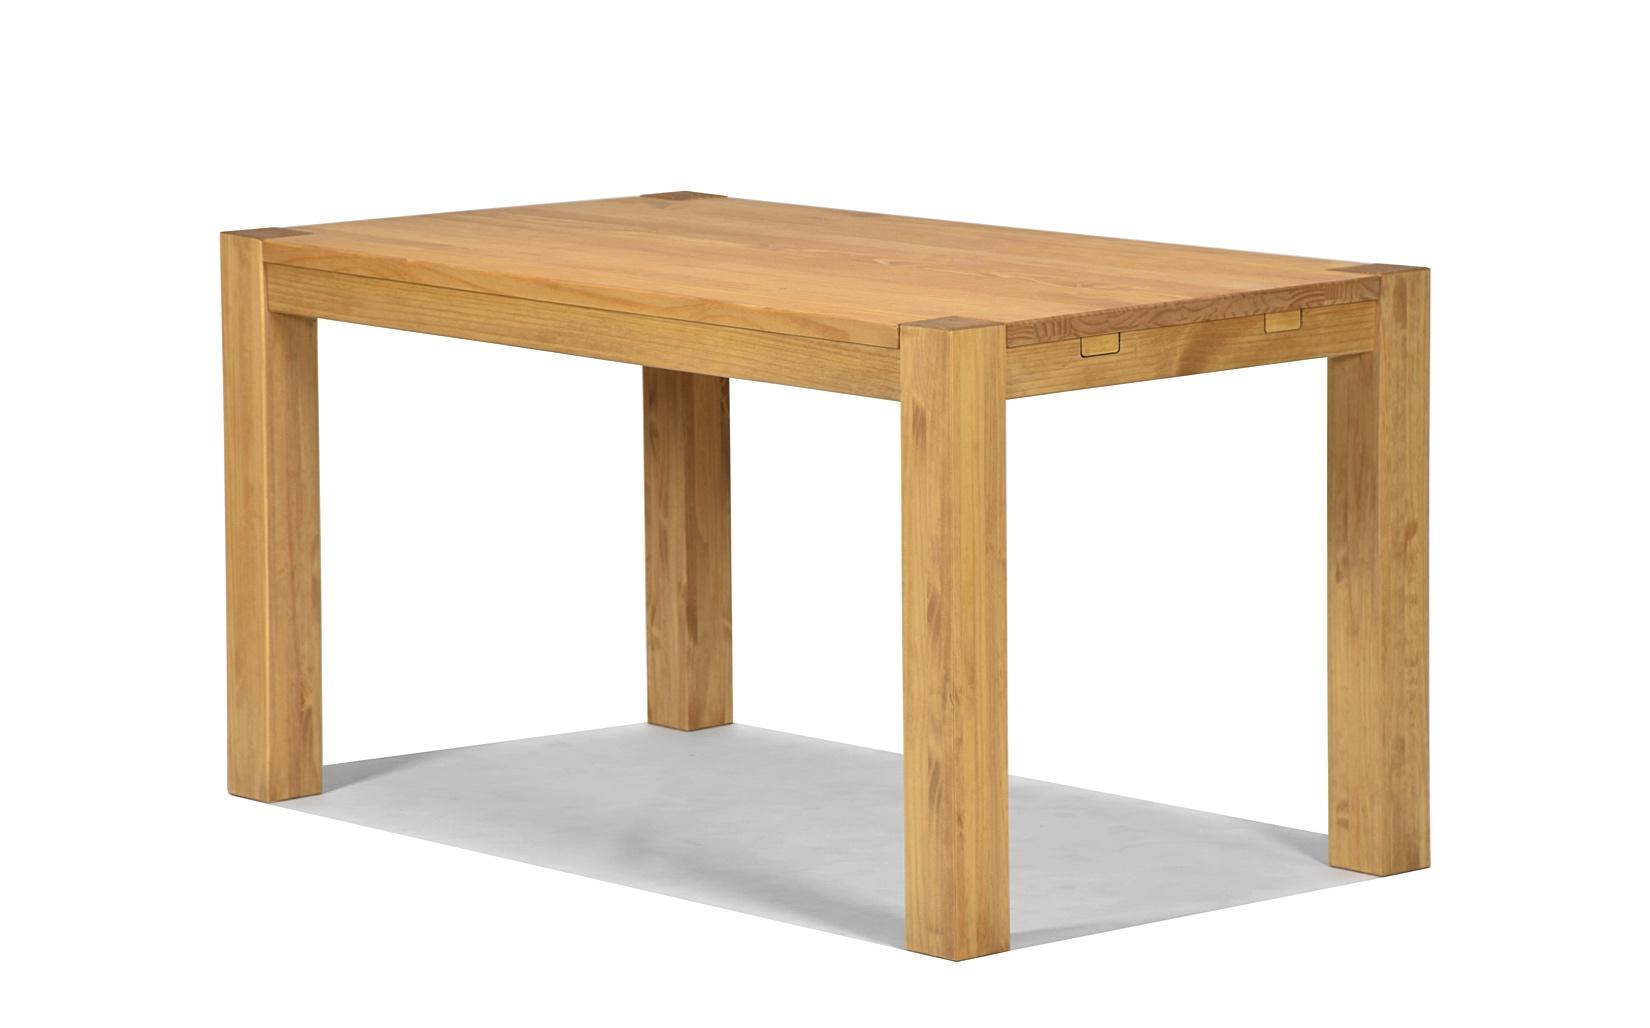 Esstisch Rio Bonito Massivholz Tisch 140x80cm Pinie massiv Honig hell